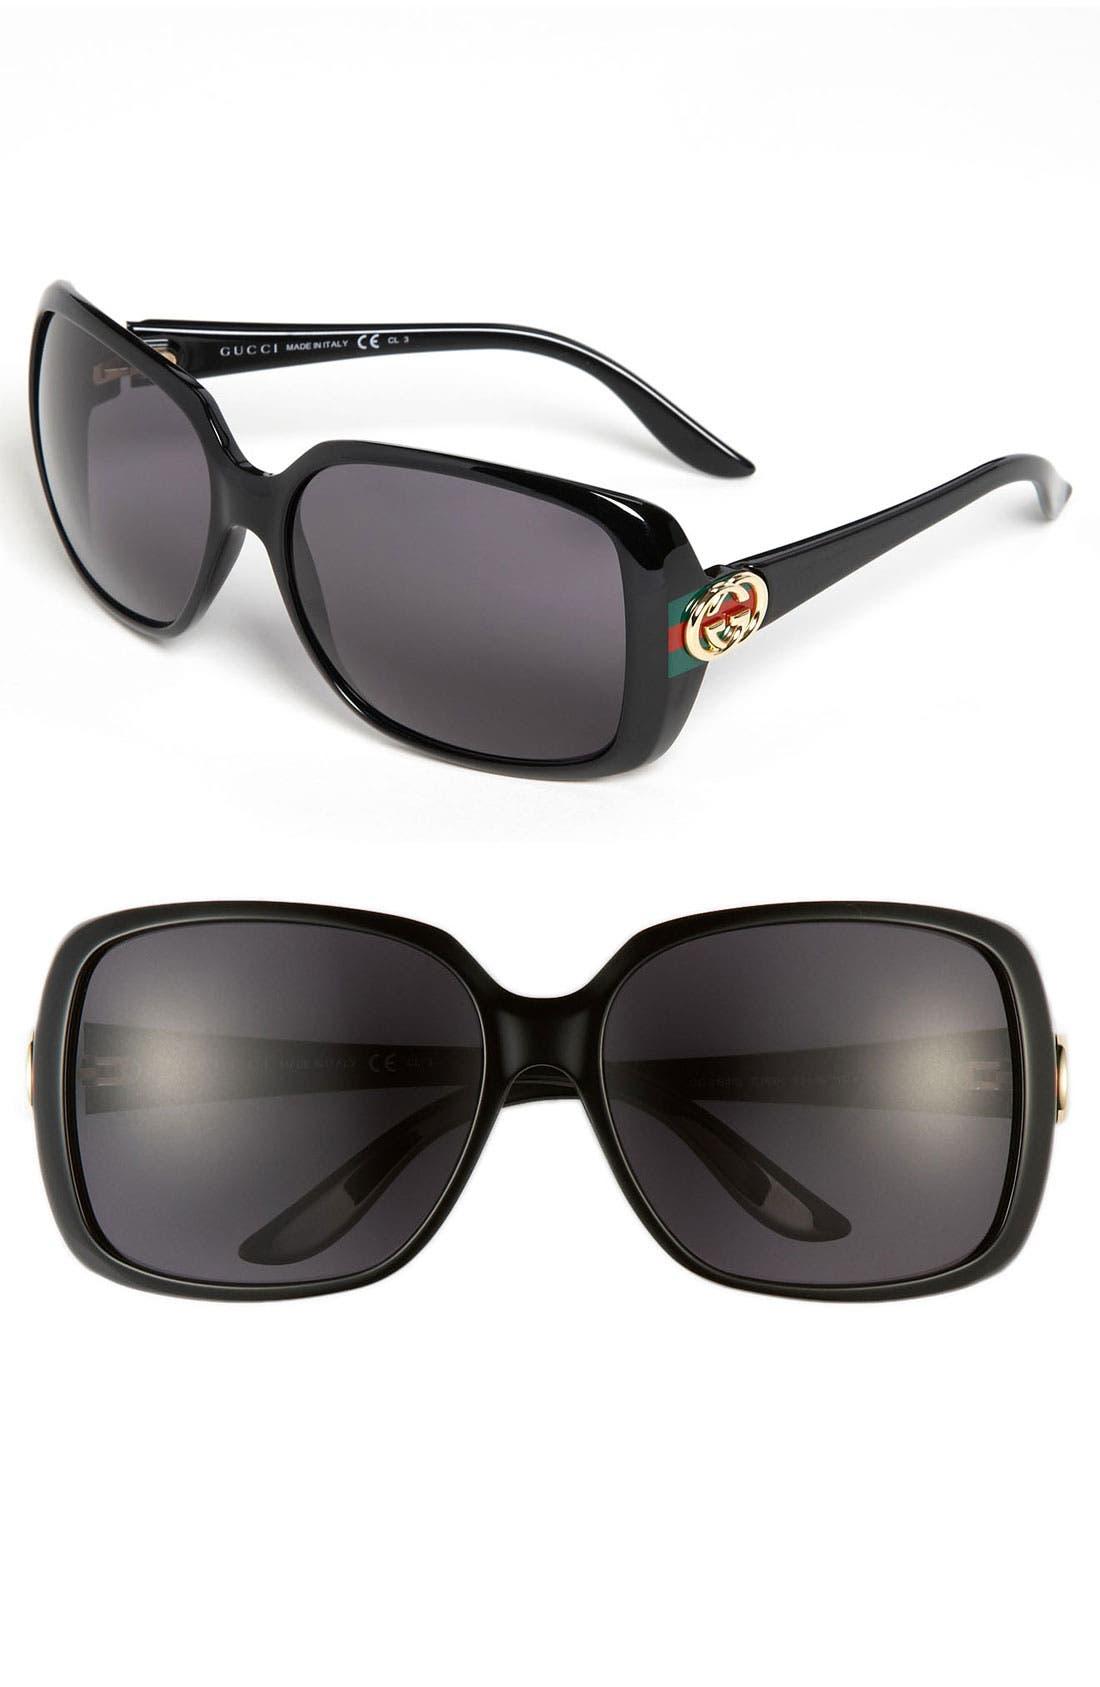 Main Image - Gucci 59mm Polarized Sunglasses